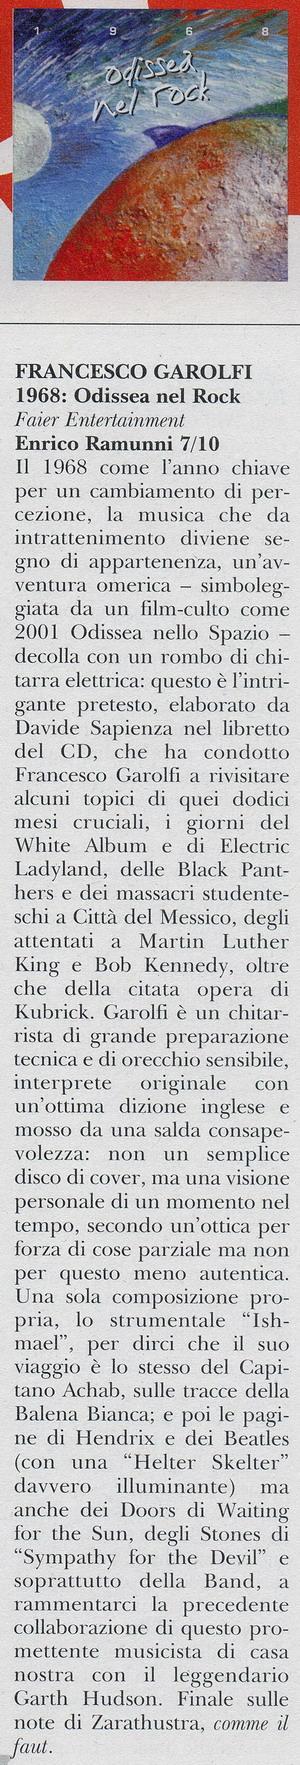 Francesco Garolfi Rockerilla 1968 Odissea nel Rock